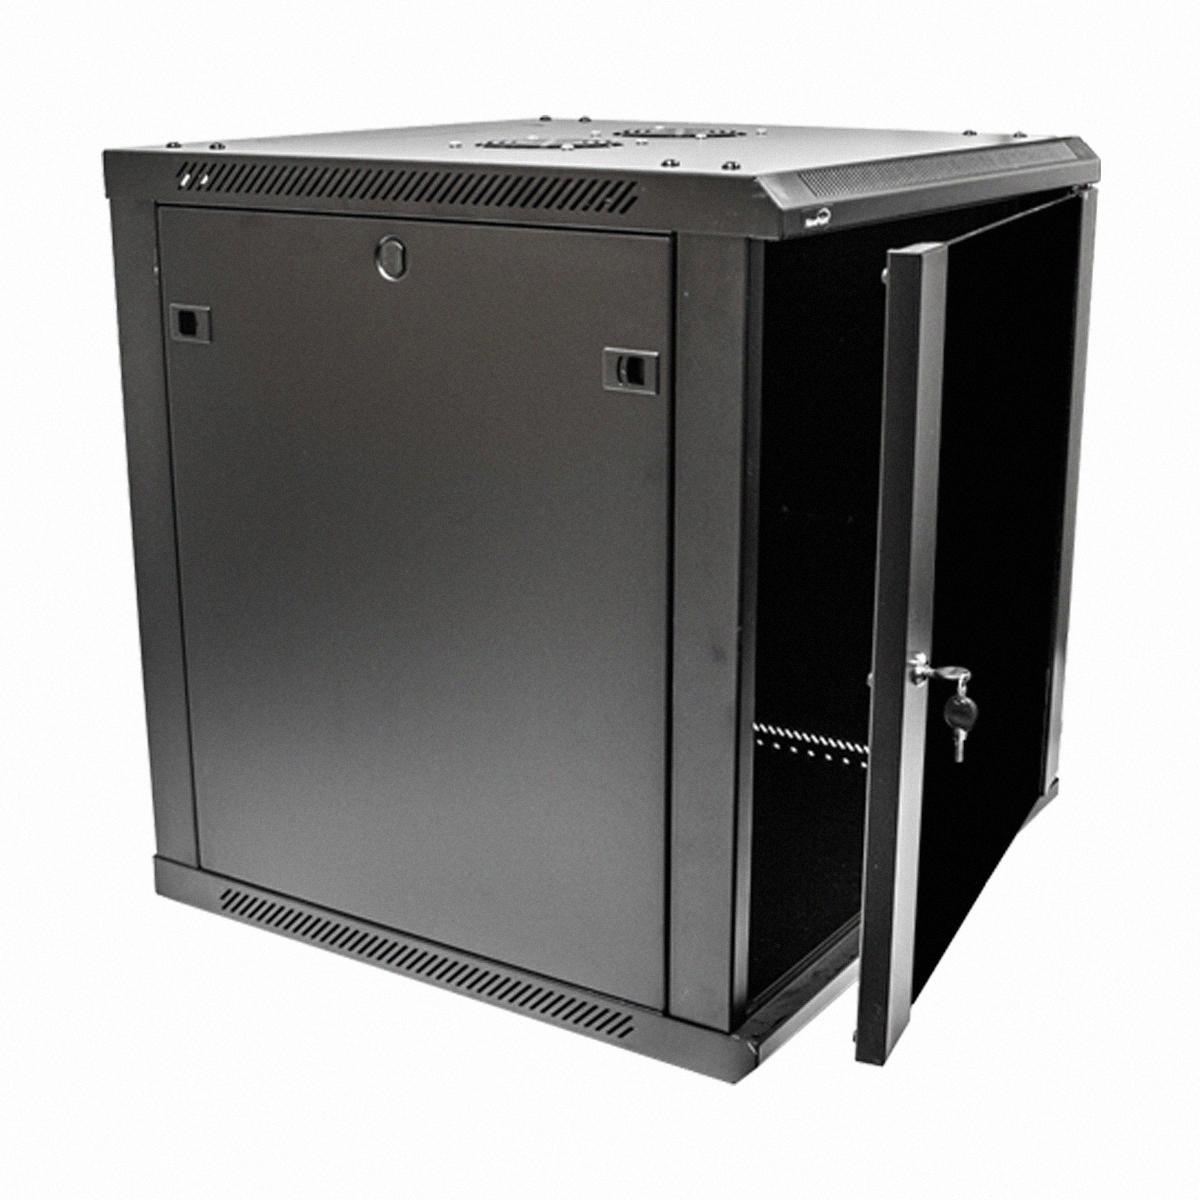 12U Wall Mount Network Server Data Cabinet 24inch Depth Glass Door Lock  Key  eBay